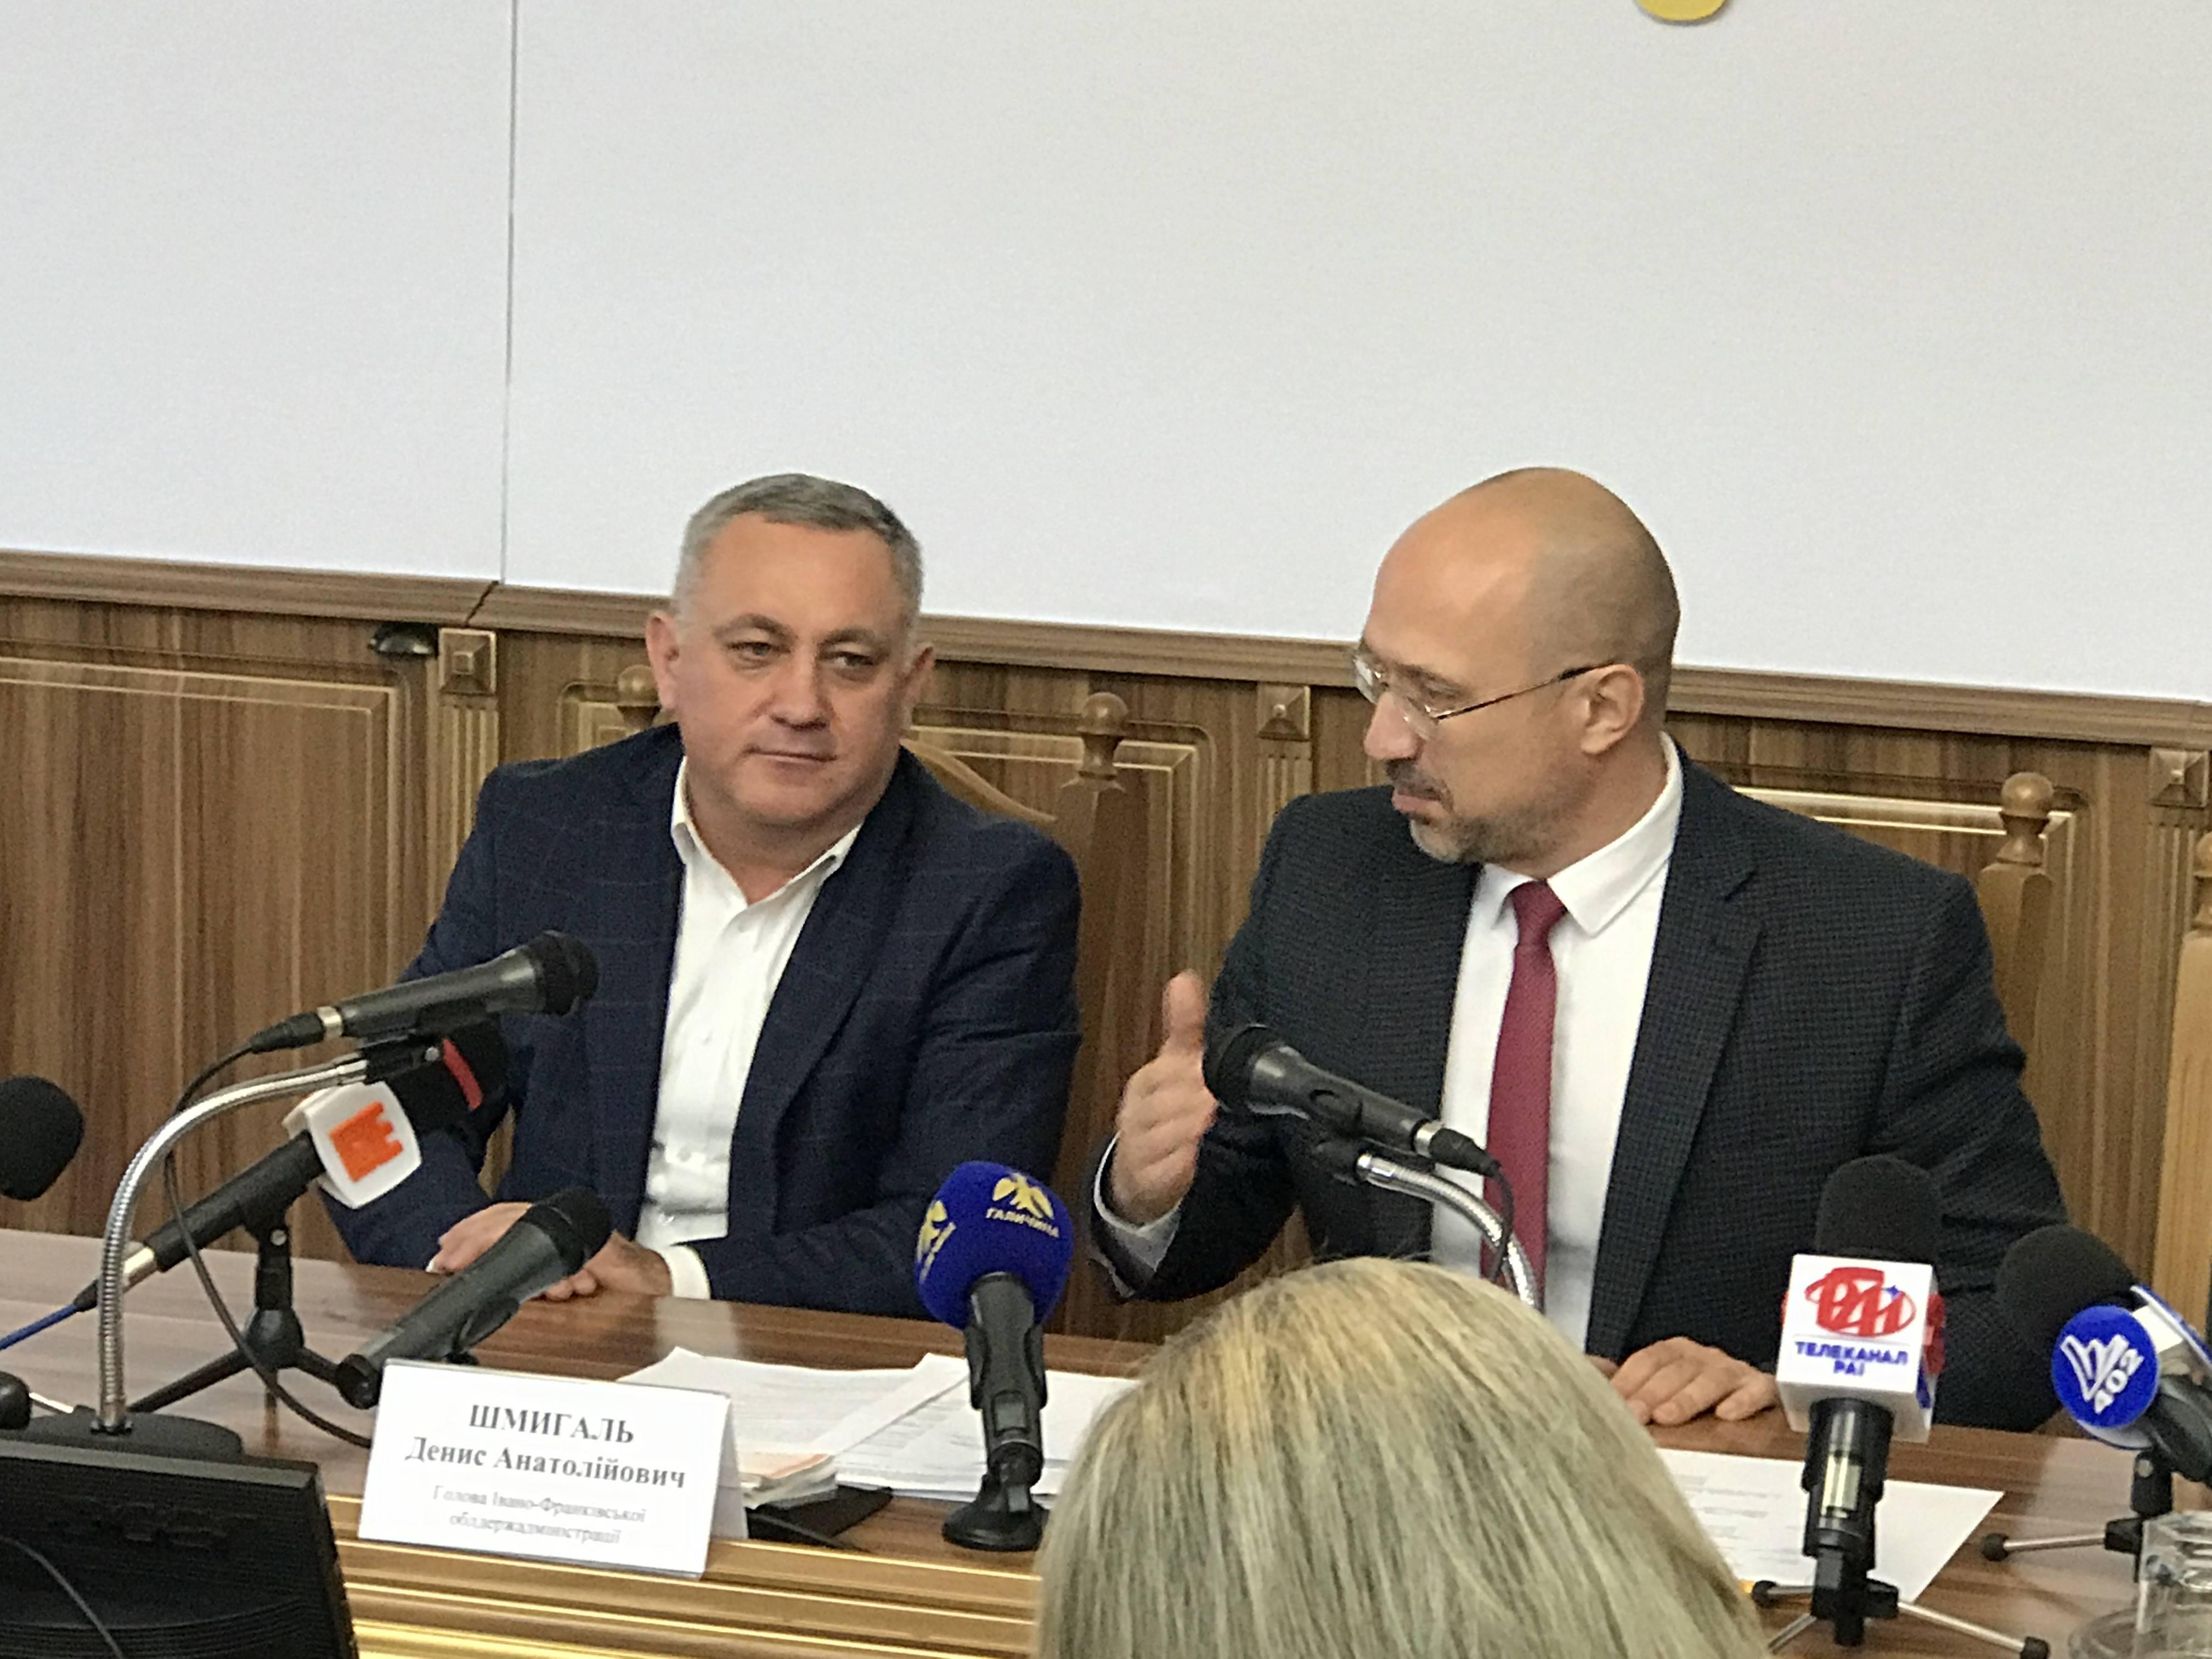 Шмигаль показав чиновникам нового голову УСБУ на Прикарпатті (ФОТО)